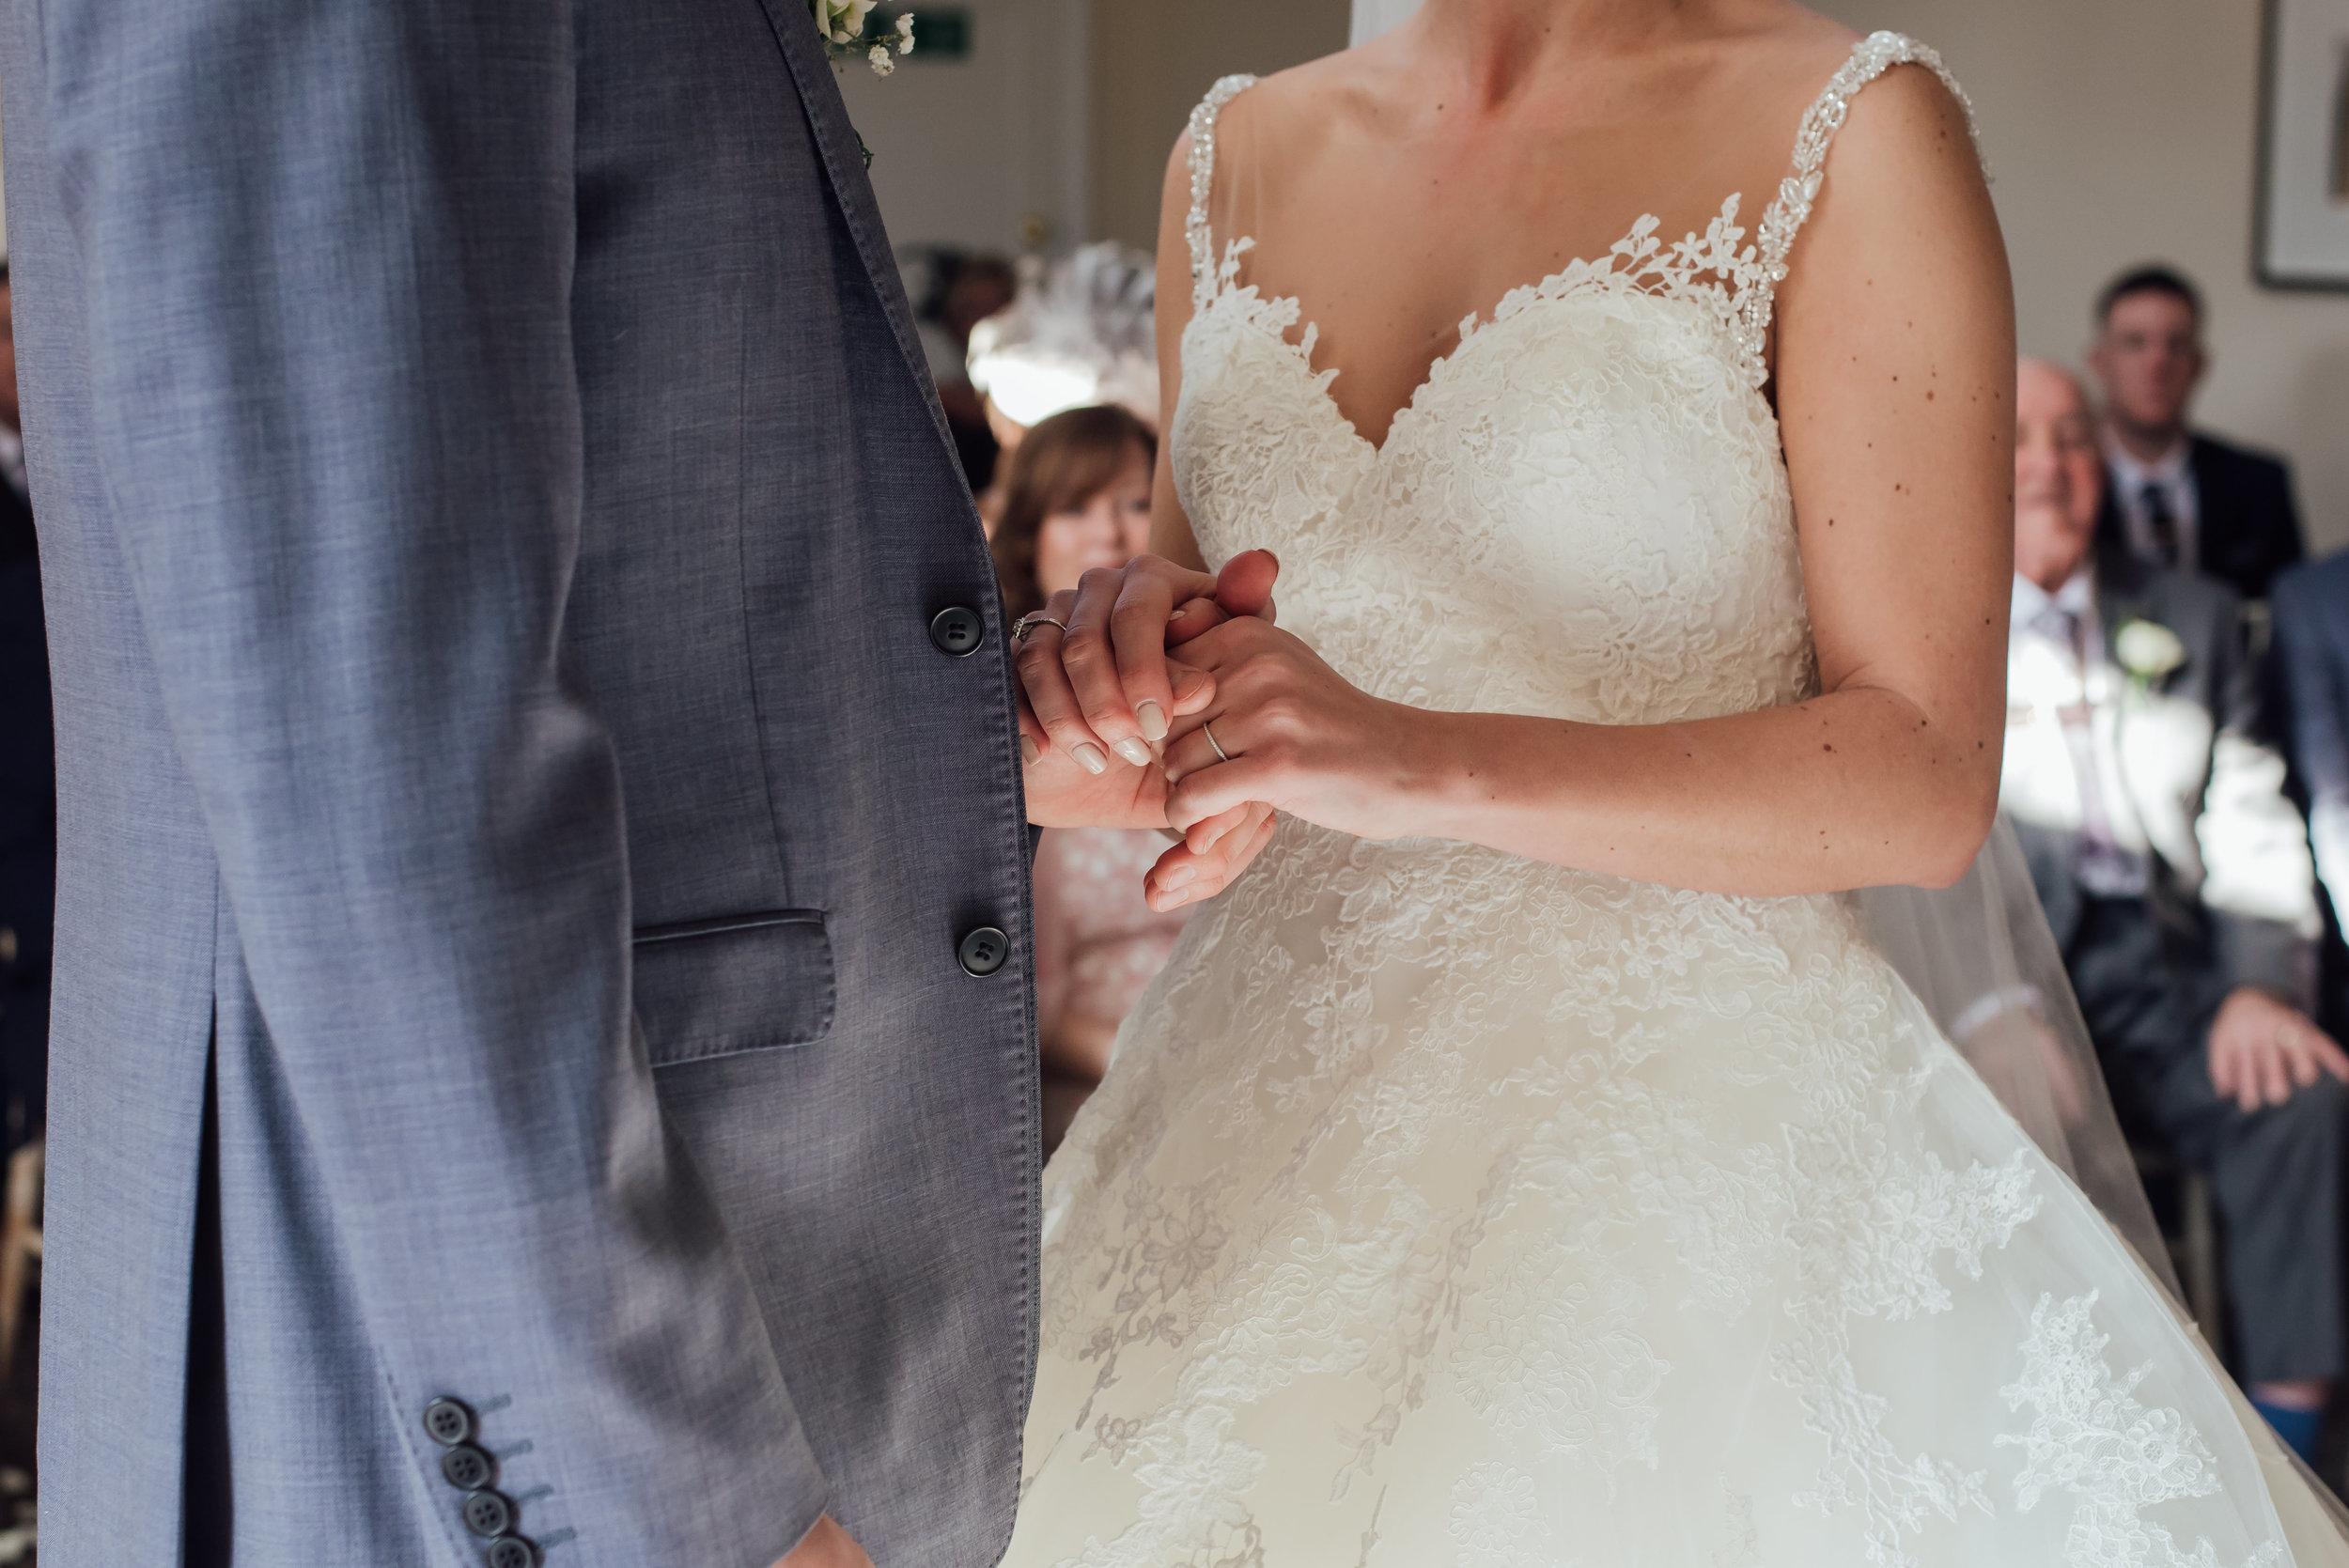 Sarah-Fishlock-Photography-Hampshire-wedding-photographer : fleet-wedding-photographer-fleet : warbrook-house-wedding-venue : warbrook-house-wedding-photographer